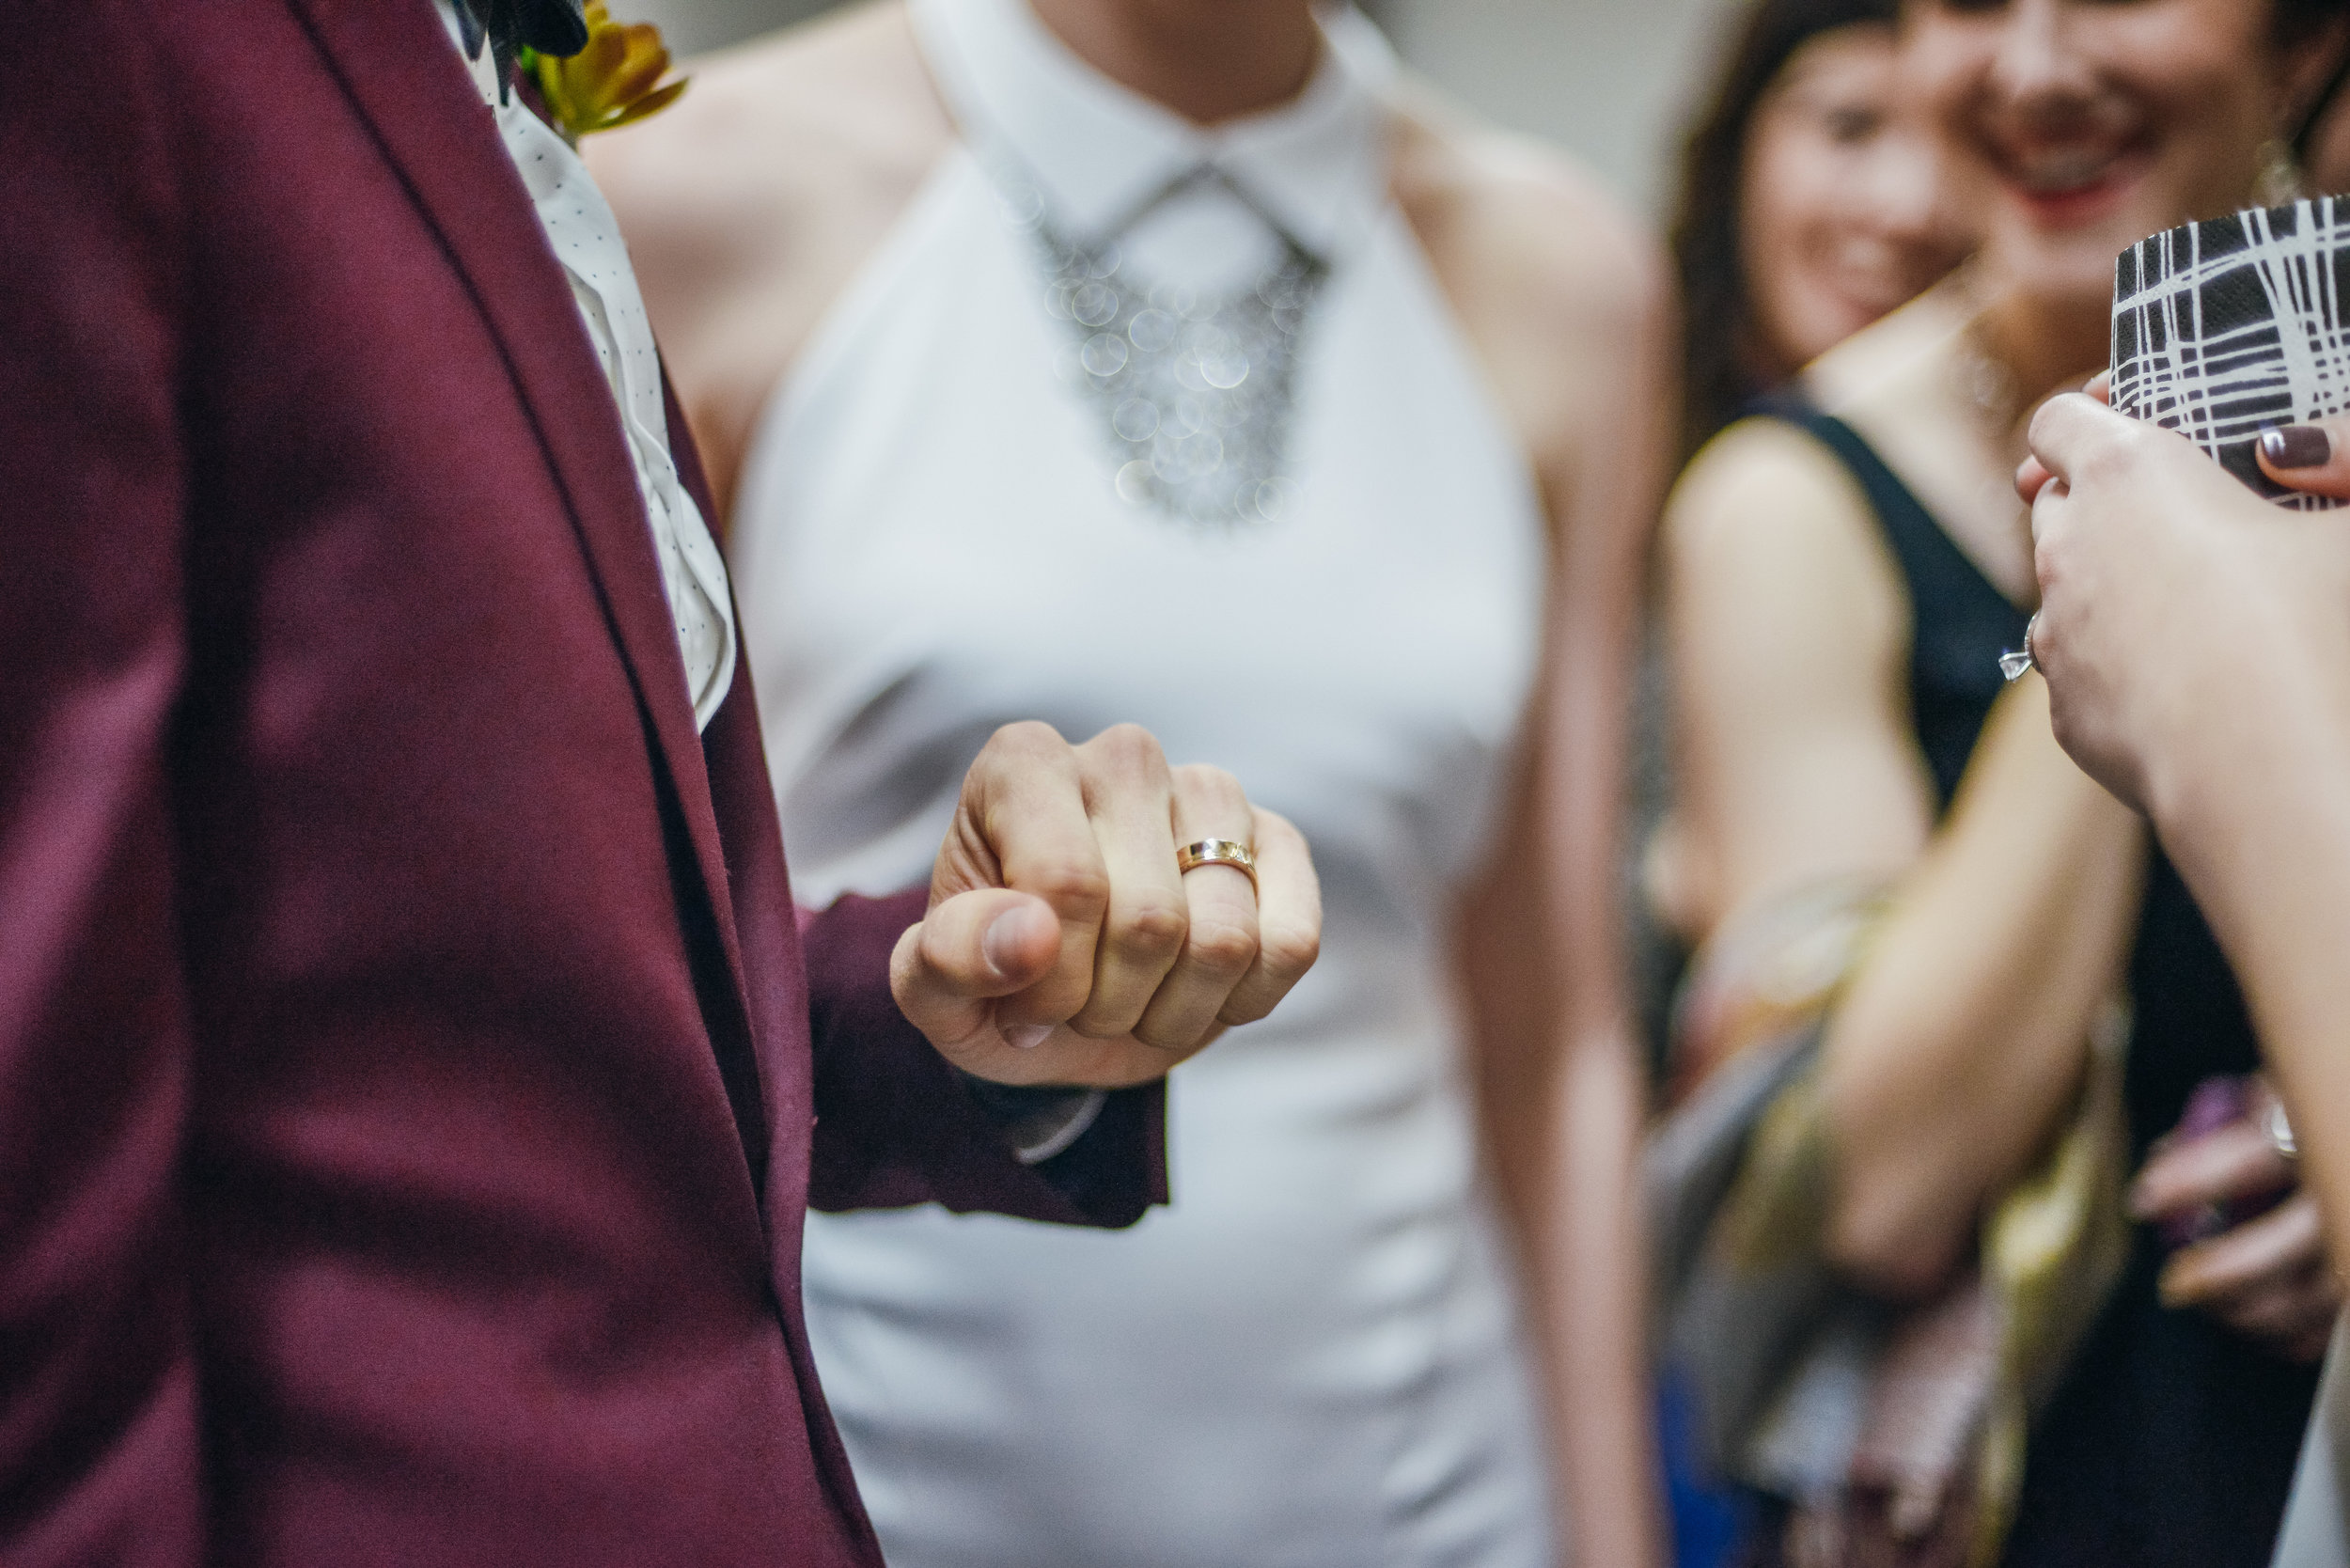 julia-hembree-photography-eden-village-church-wedding-savannah-warehouse-wedding-ivory-and-beau-bridal-boutique-savannah-florist-savannah-wedding-planner-savannah-event-design-scad-wedding-artist-wedding-savannah-funky-wedding-handmade-wedding-57.jpg